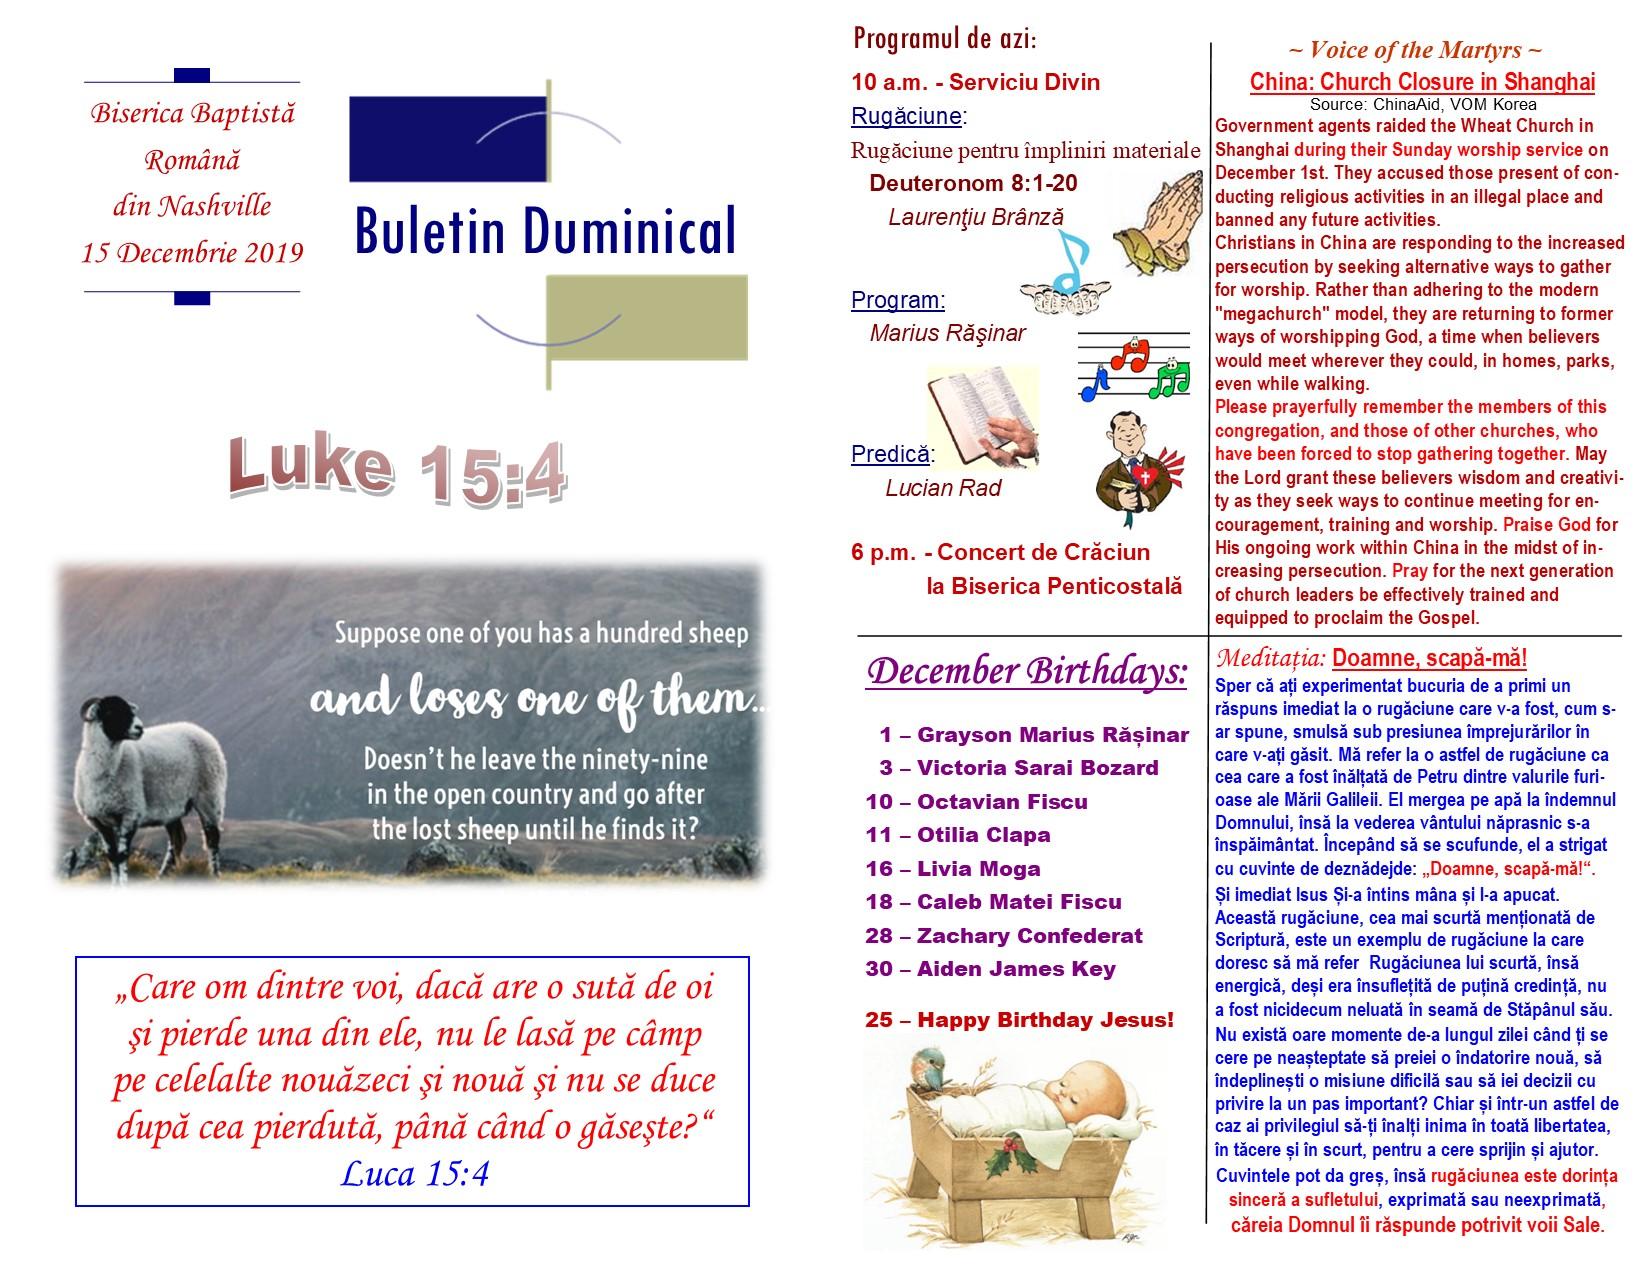 Buletin 12-15-19 page 1 & 2